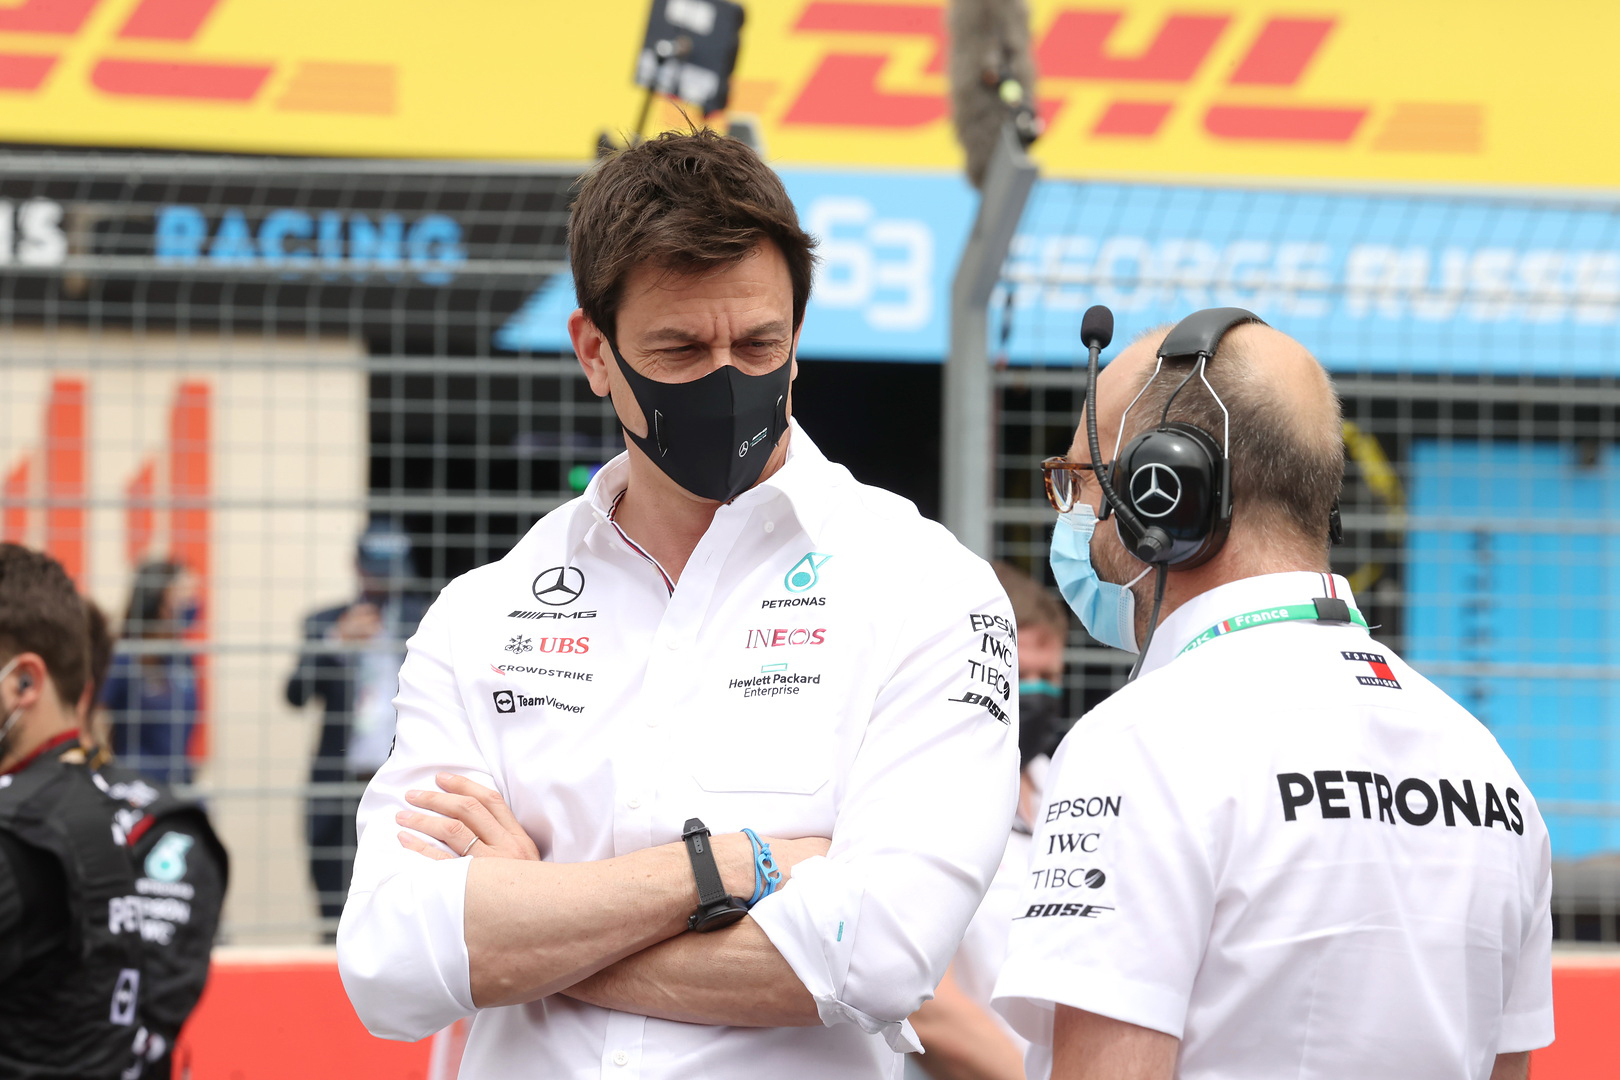 Toto Wolff ha declarado que el error de Valtteri Bottas en el Hungarian GP tras la salida no les va a influenciar